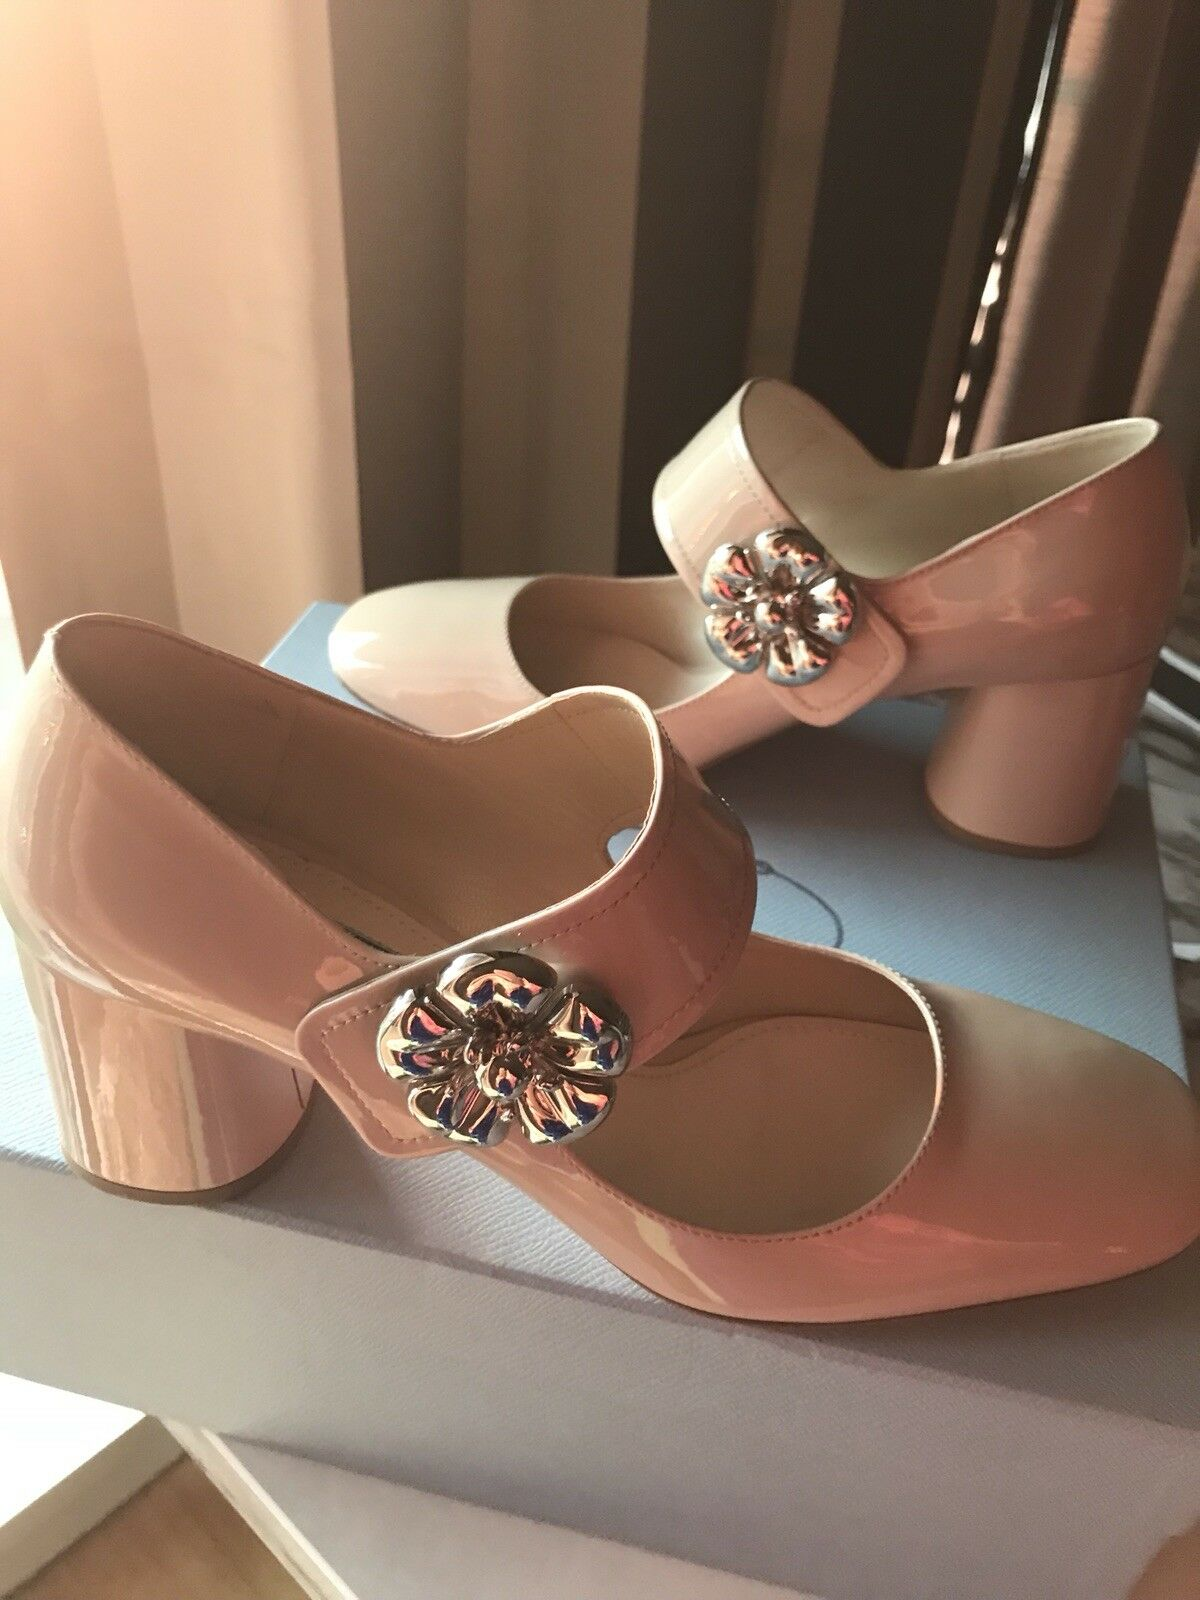 femmes's Prada Patent Leather Flower Ornament chaussures chaussures chaussures 6518a1